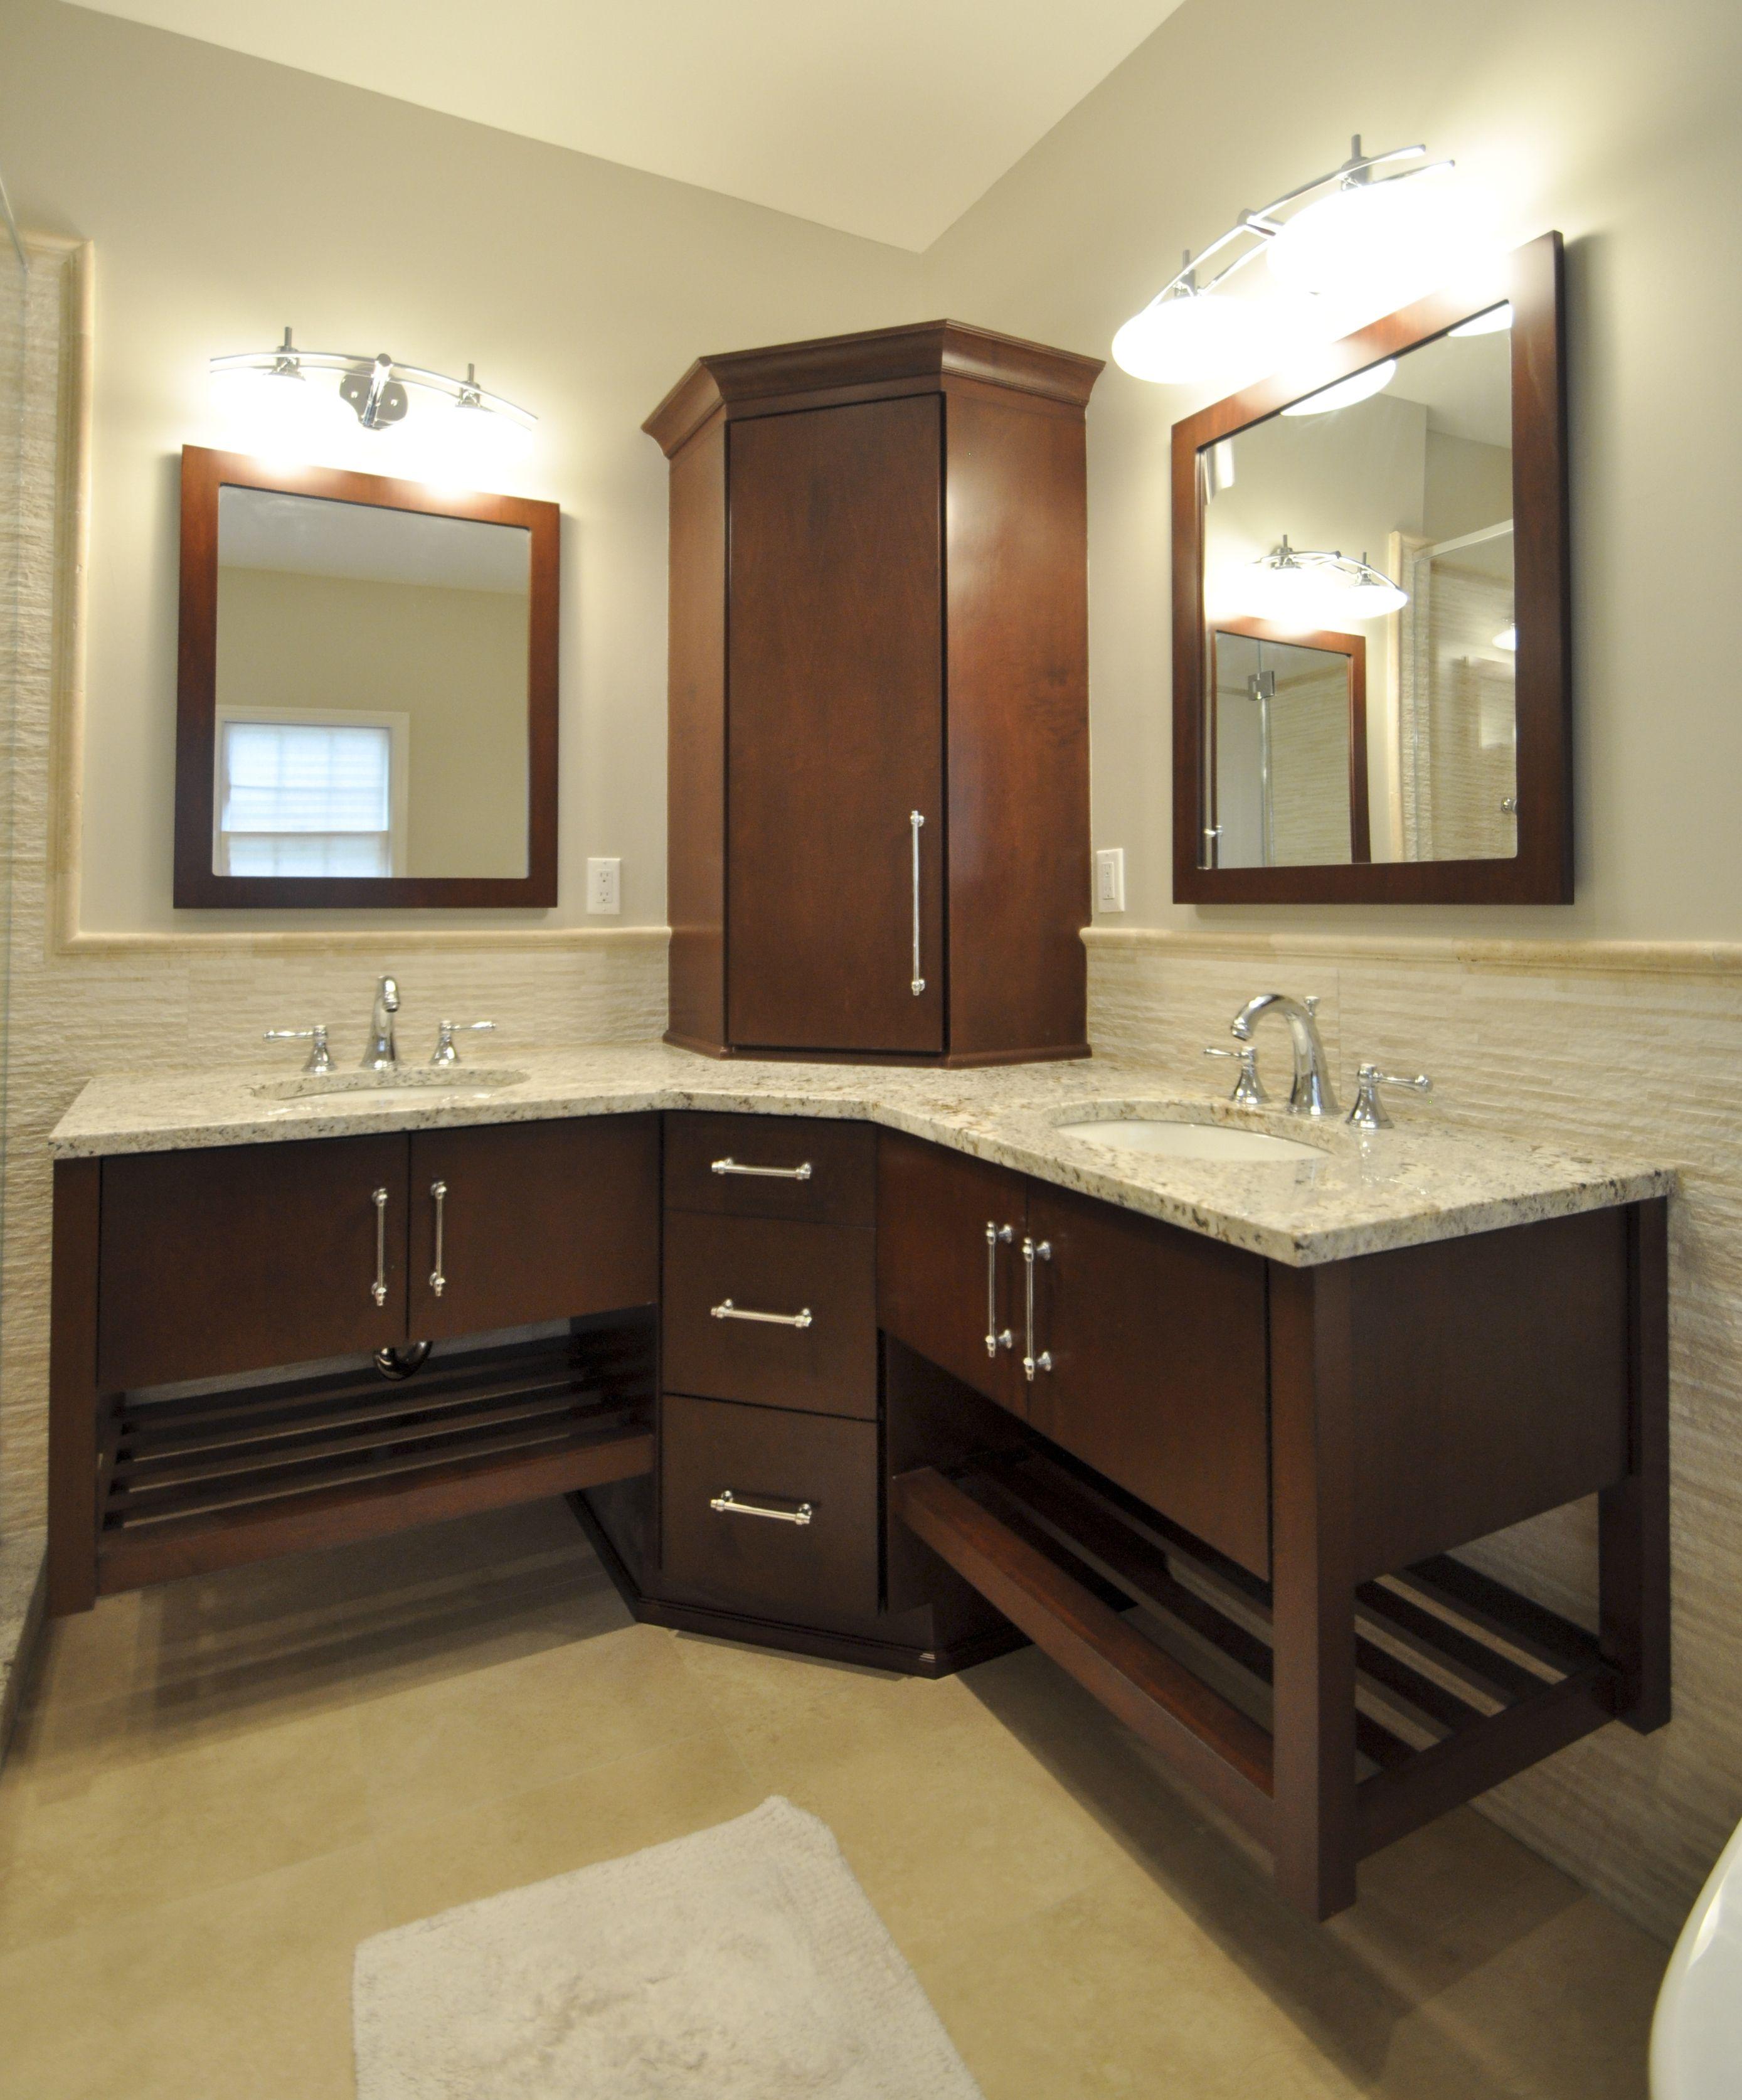 Bathrooms L Shaped Bathroom Bathroom Remodel Master Small